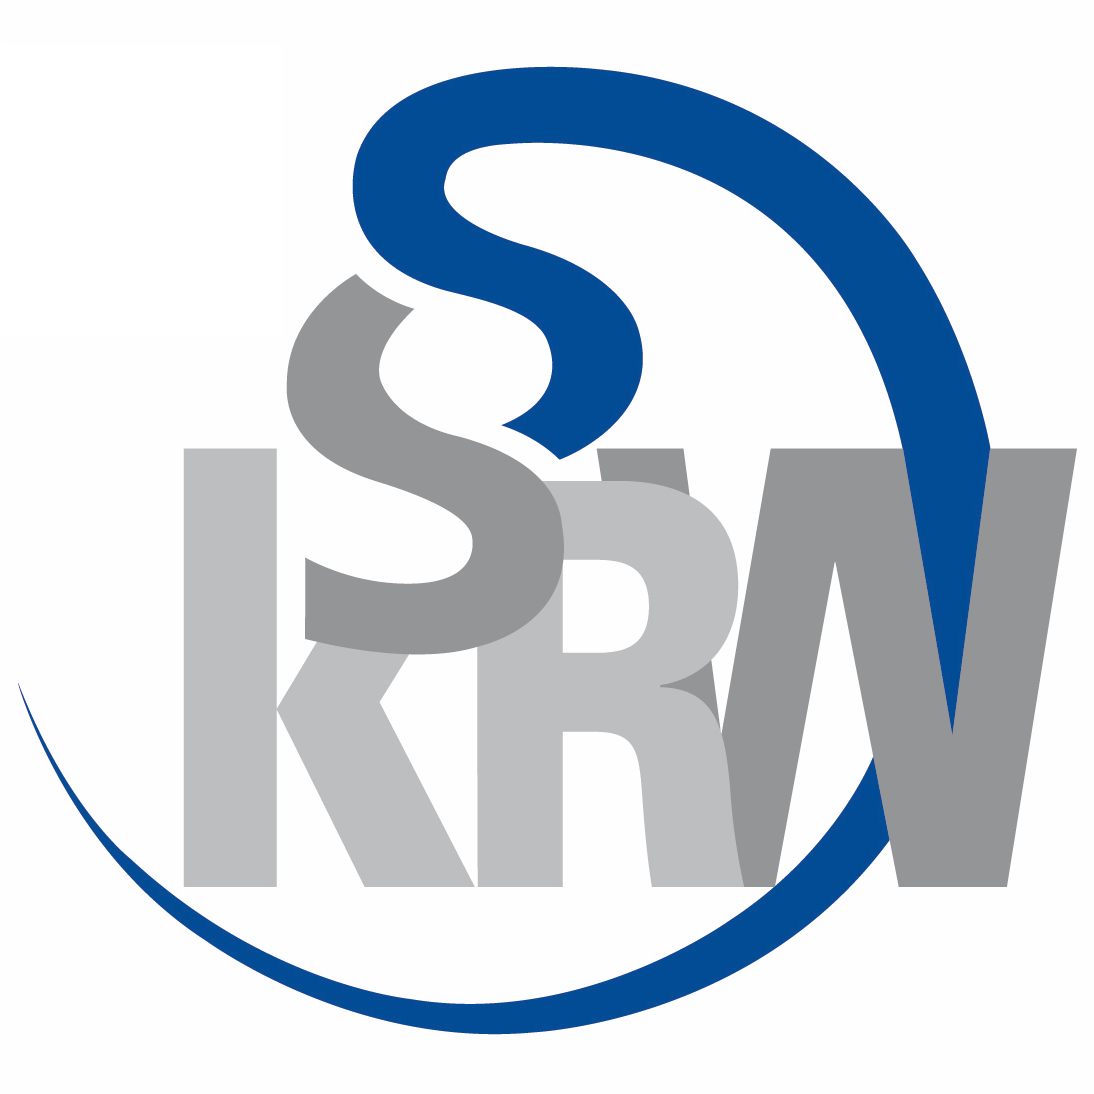 karriere.ksrw.de